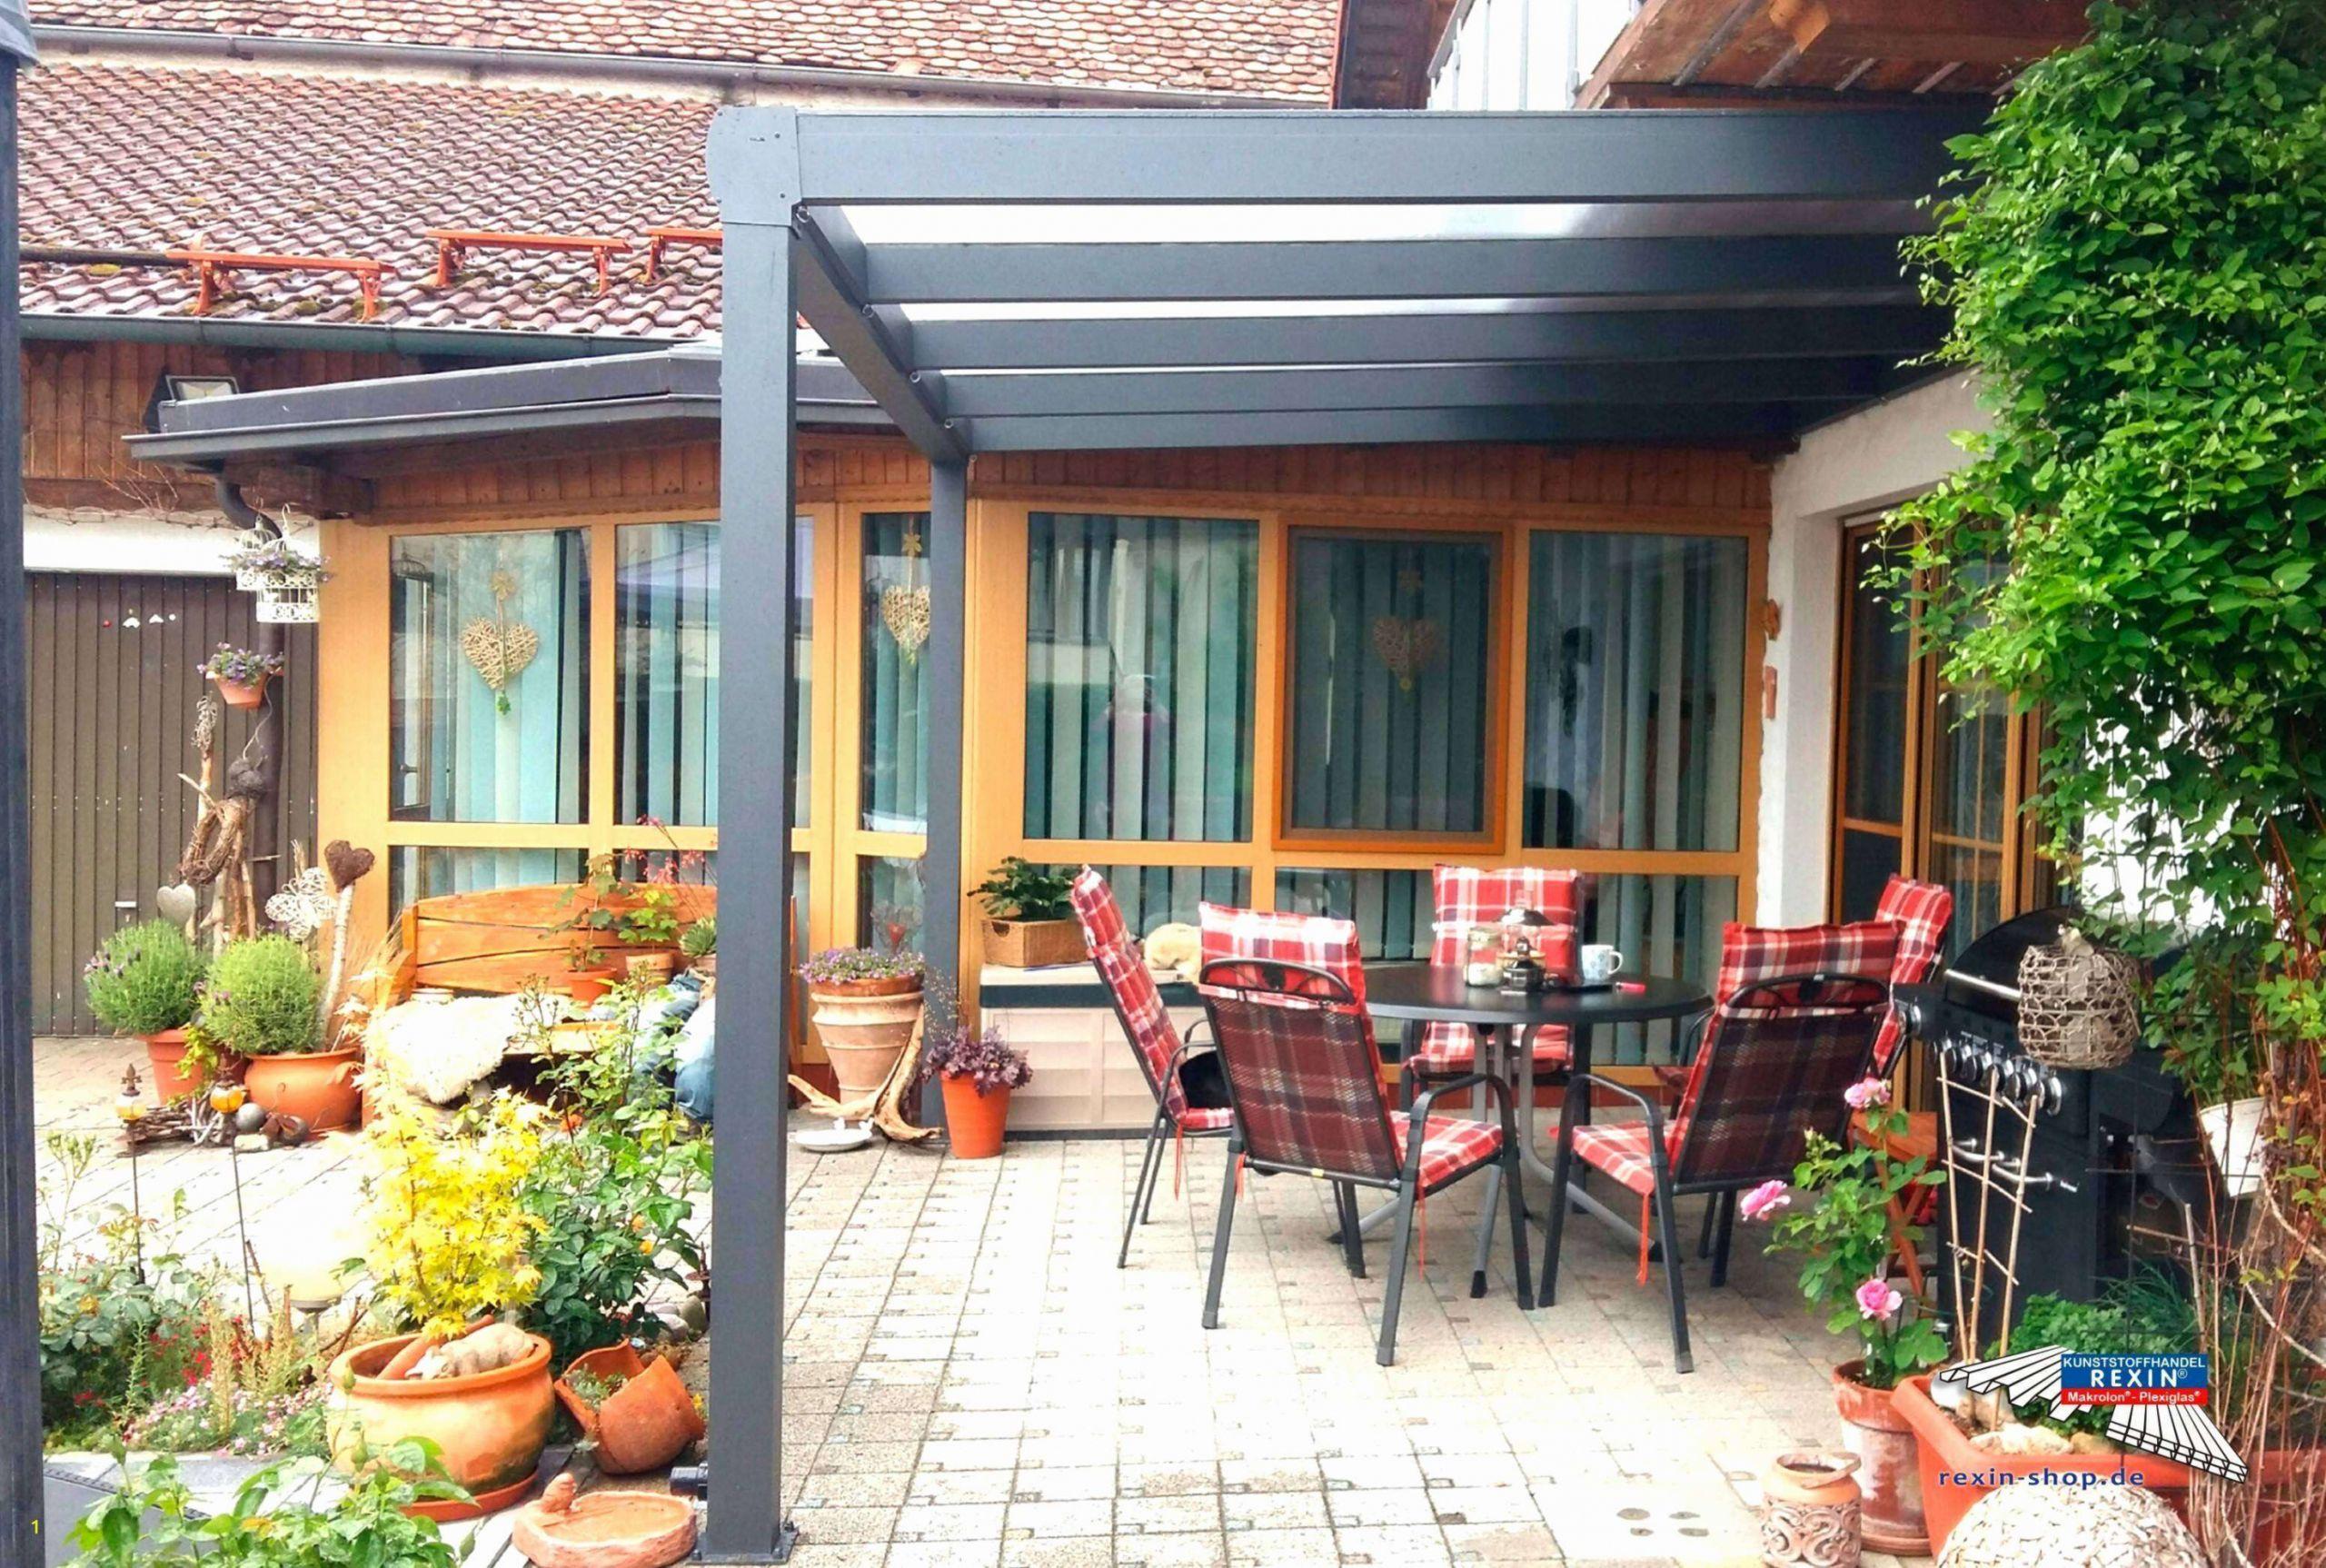 Beton Deko Garten Selber Machen Luxus Gartendeko Selber Machen — Temobardz Home Blog